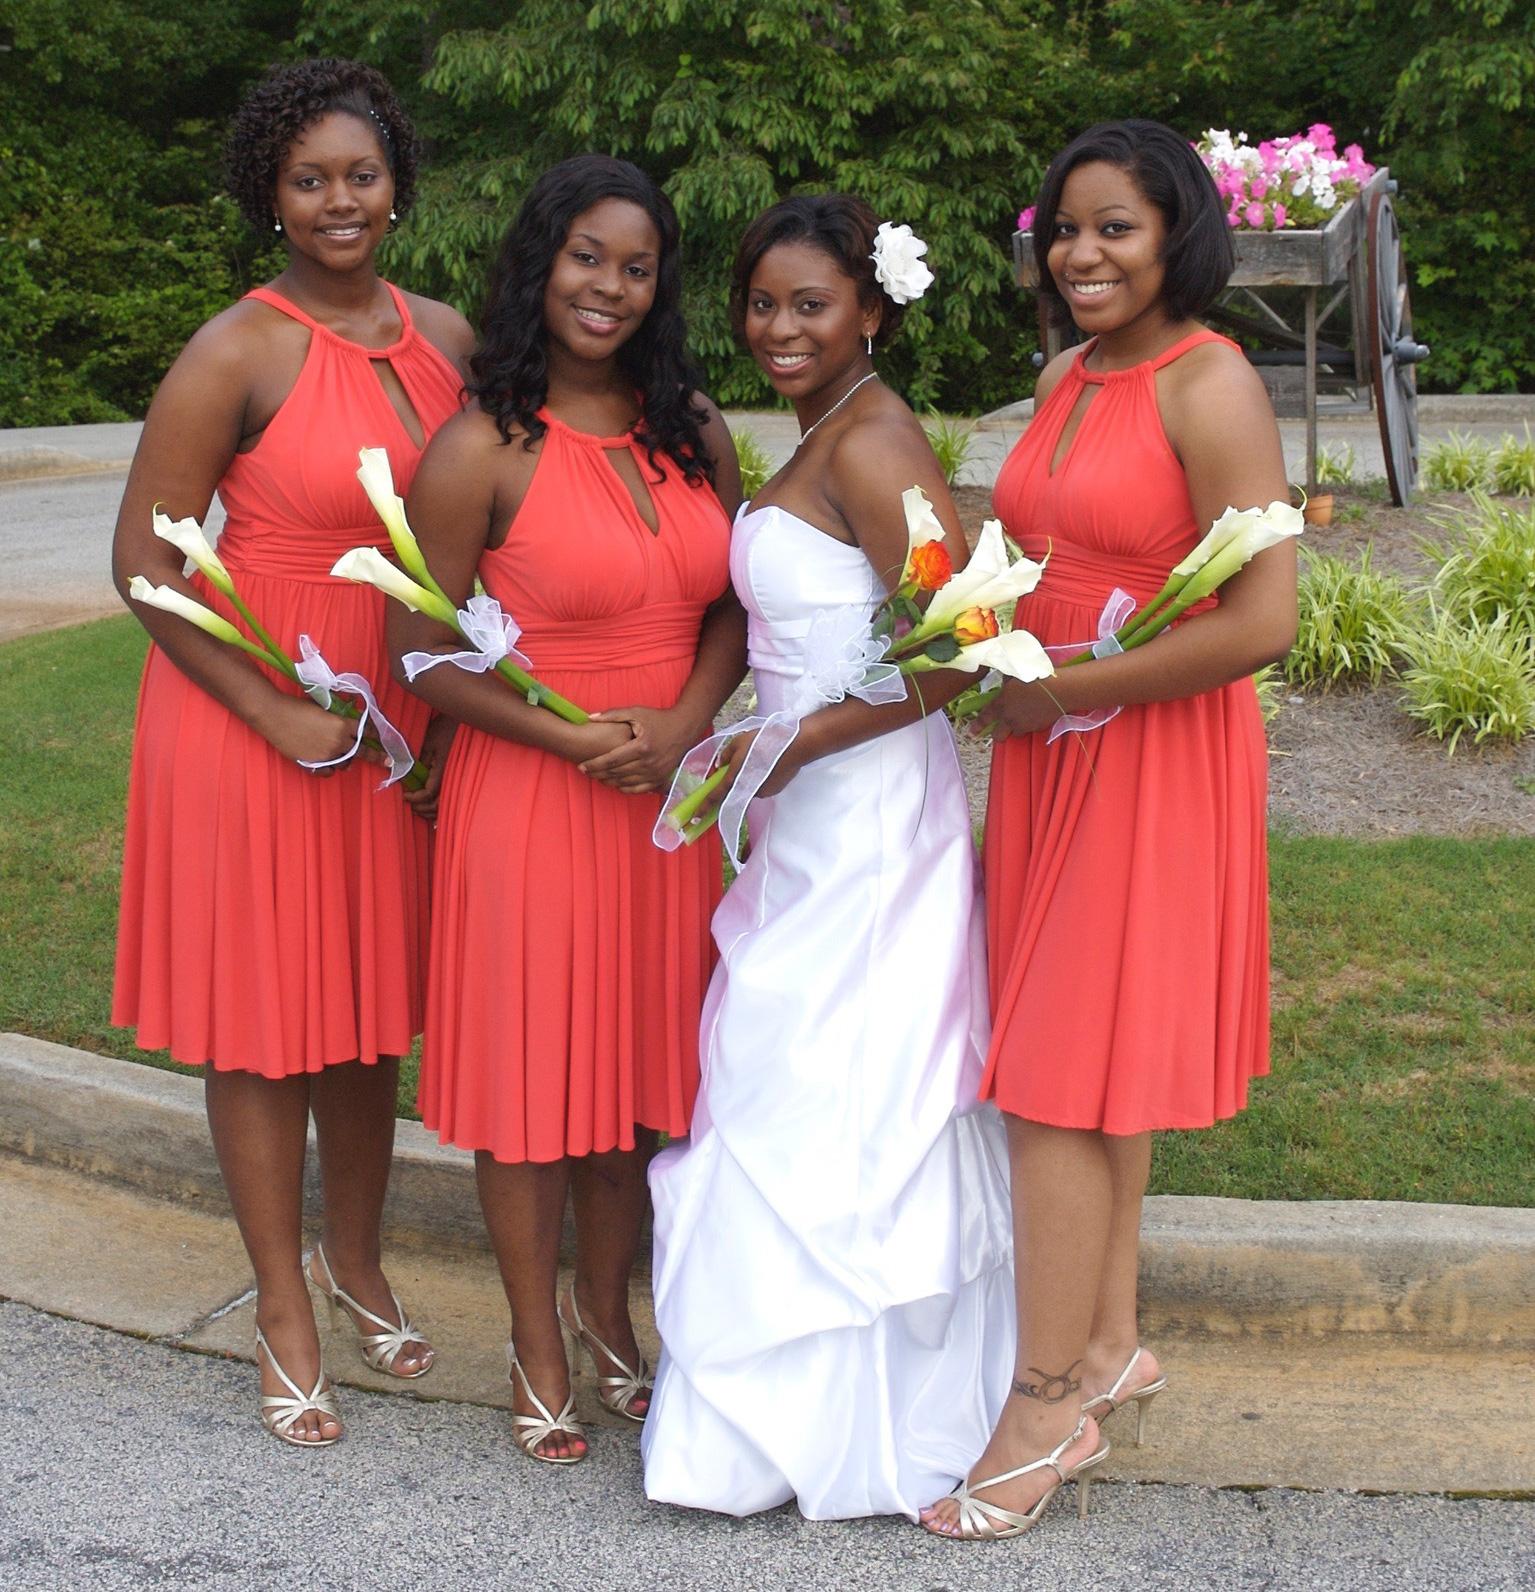 an-initimate-affair-kadians-wedding-4.jpg